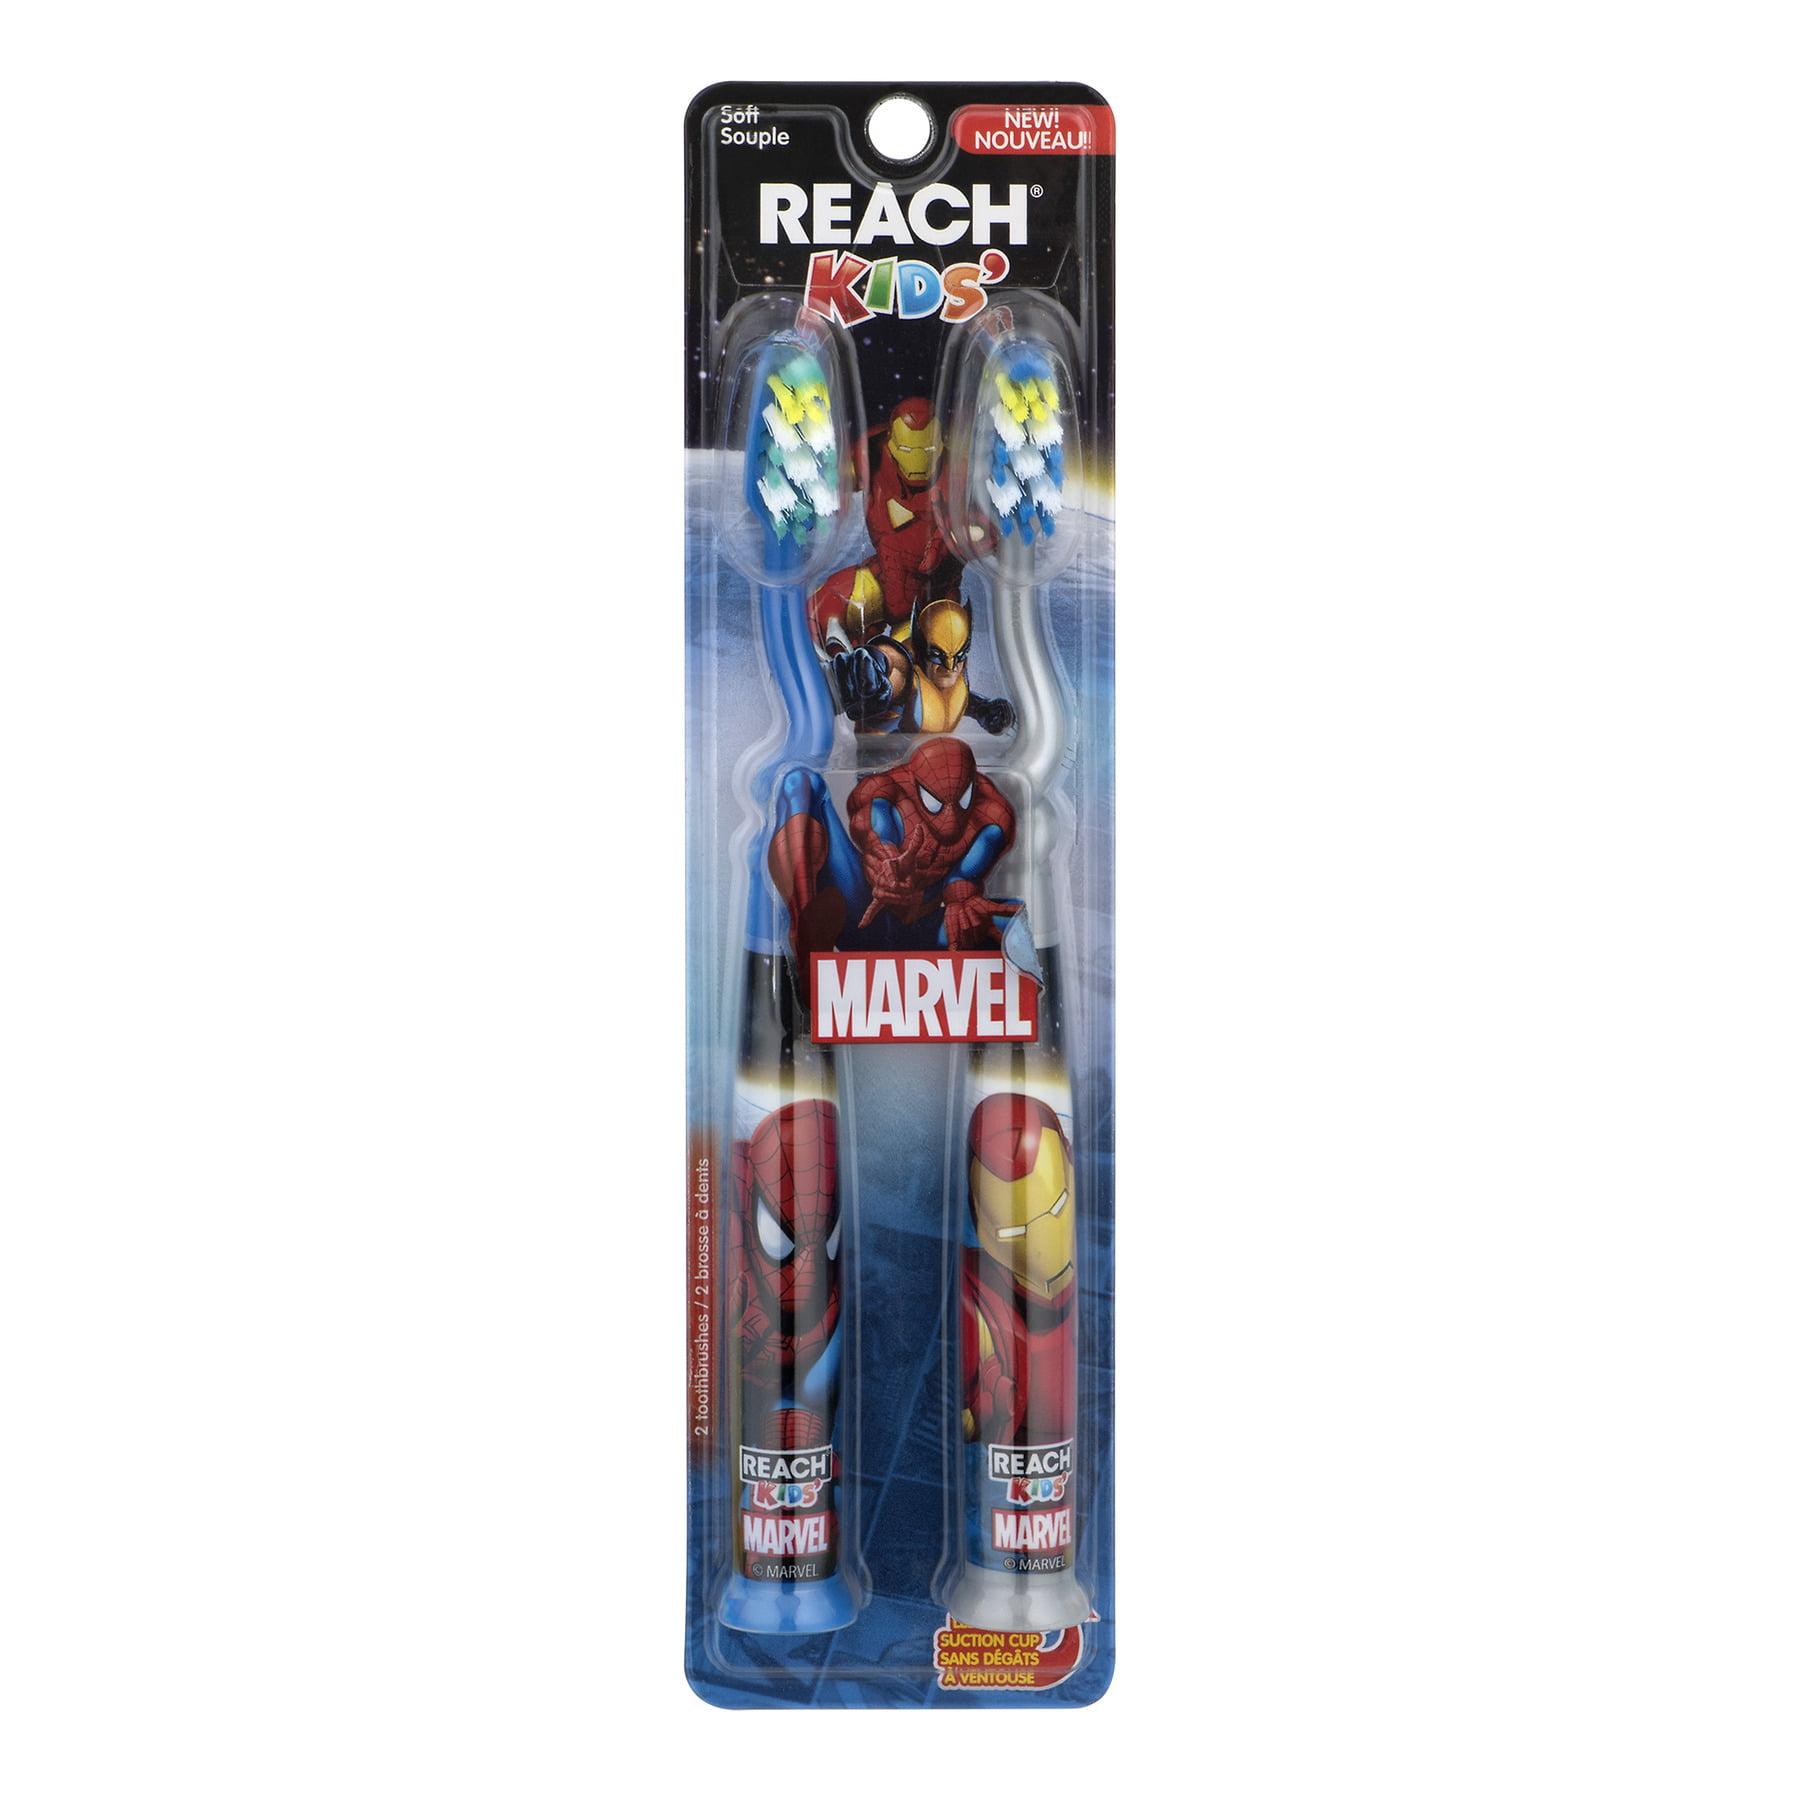 Reach Kids Marvel Hero's Soft Bi-Level Bristles Manual Toothbrushes, 2 ct